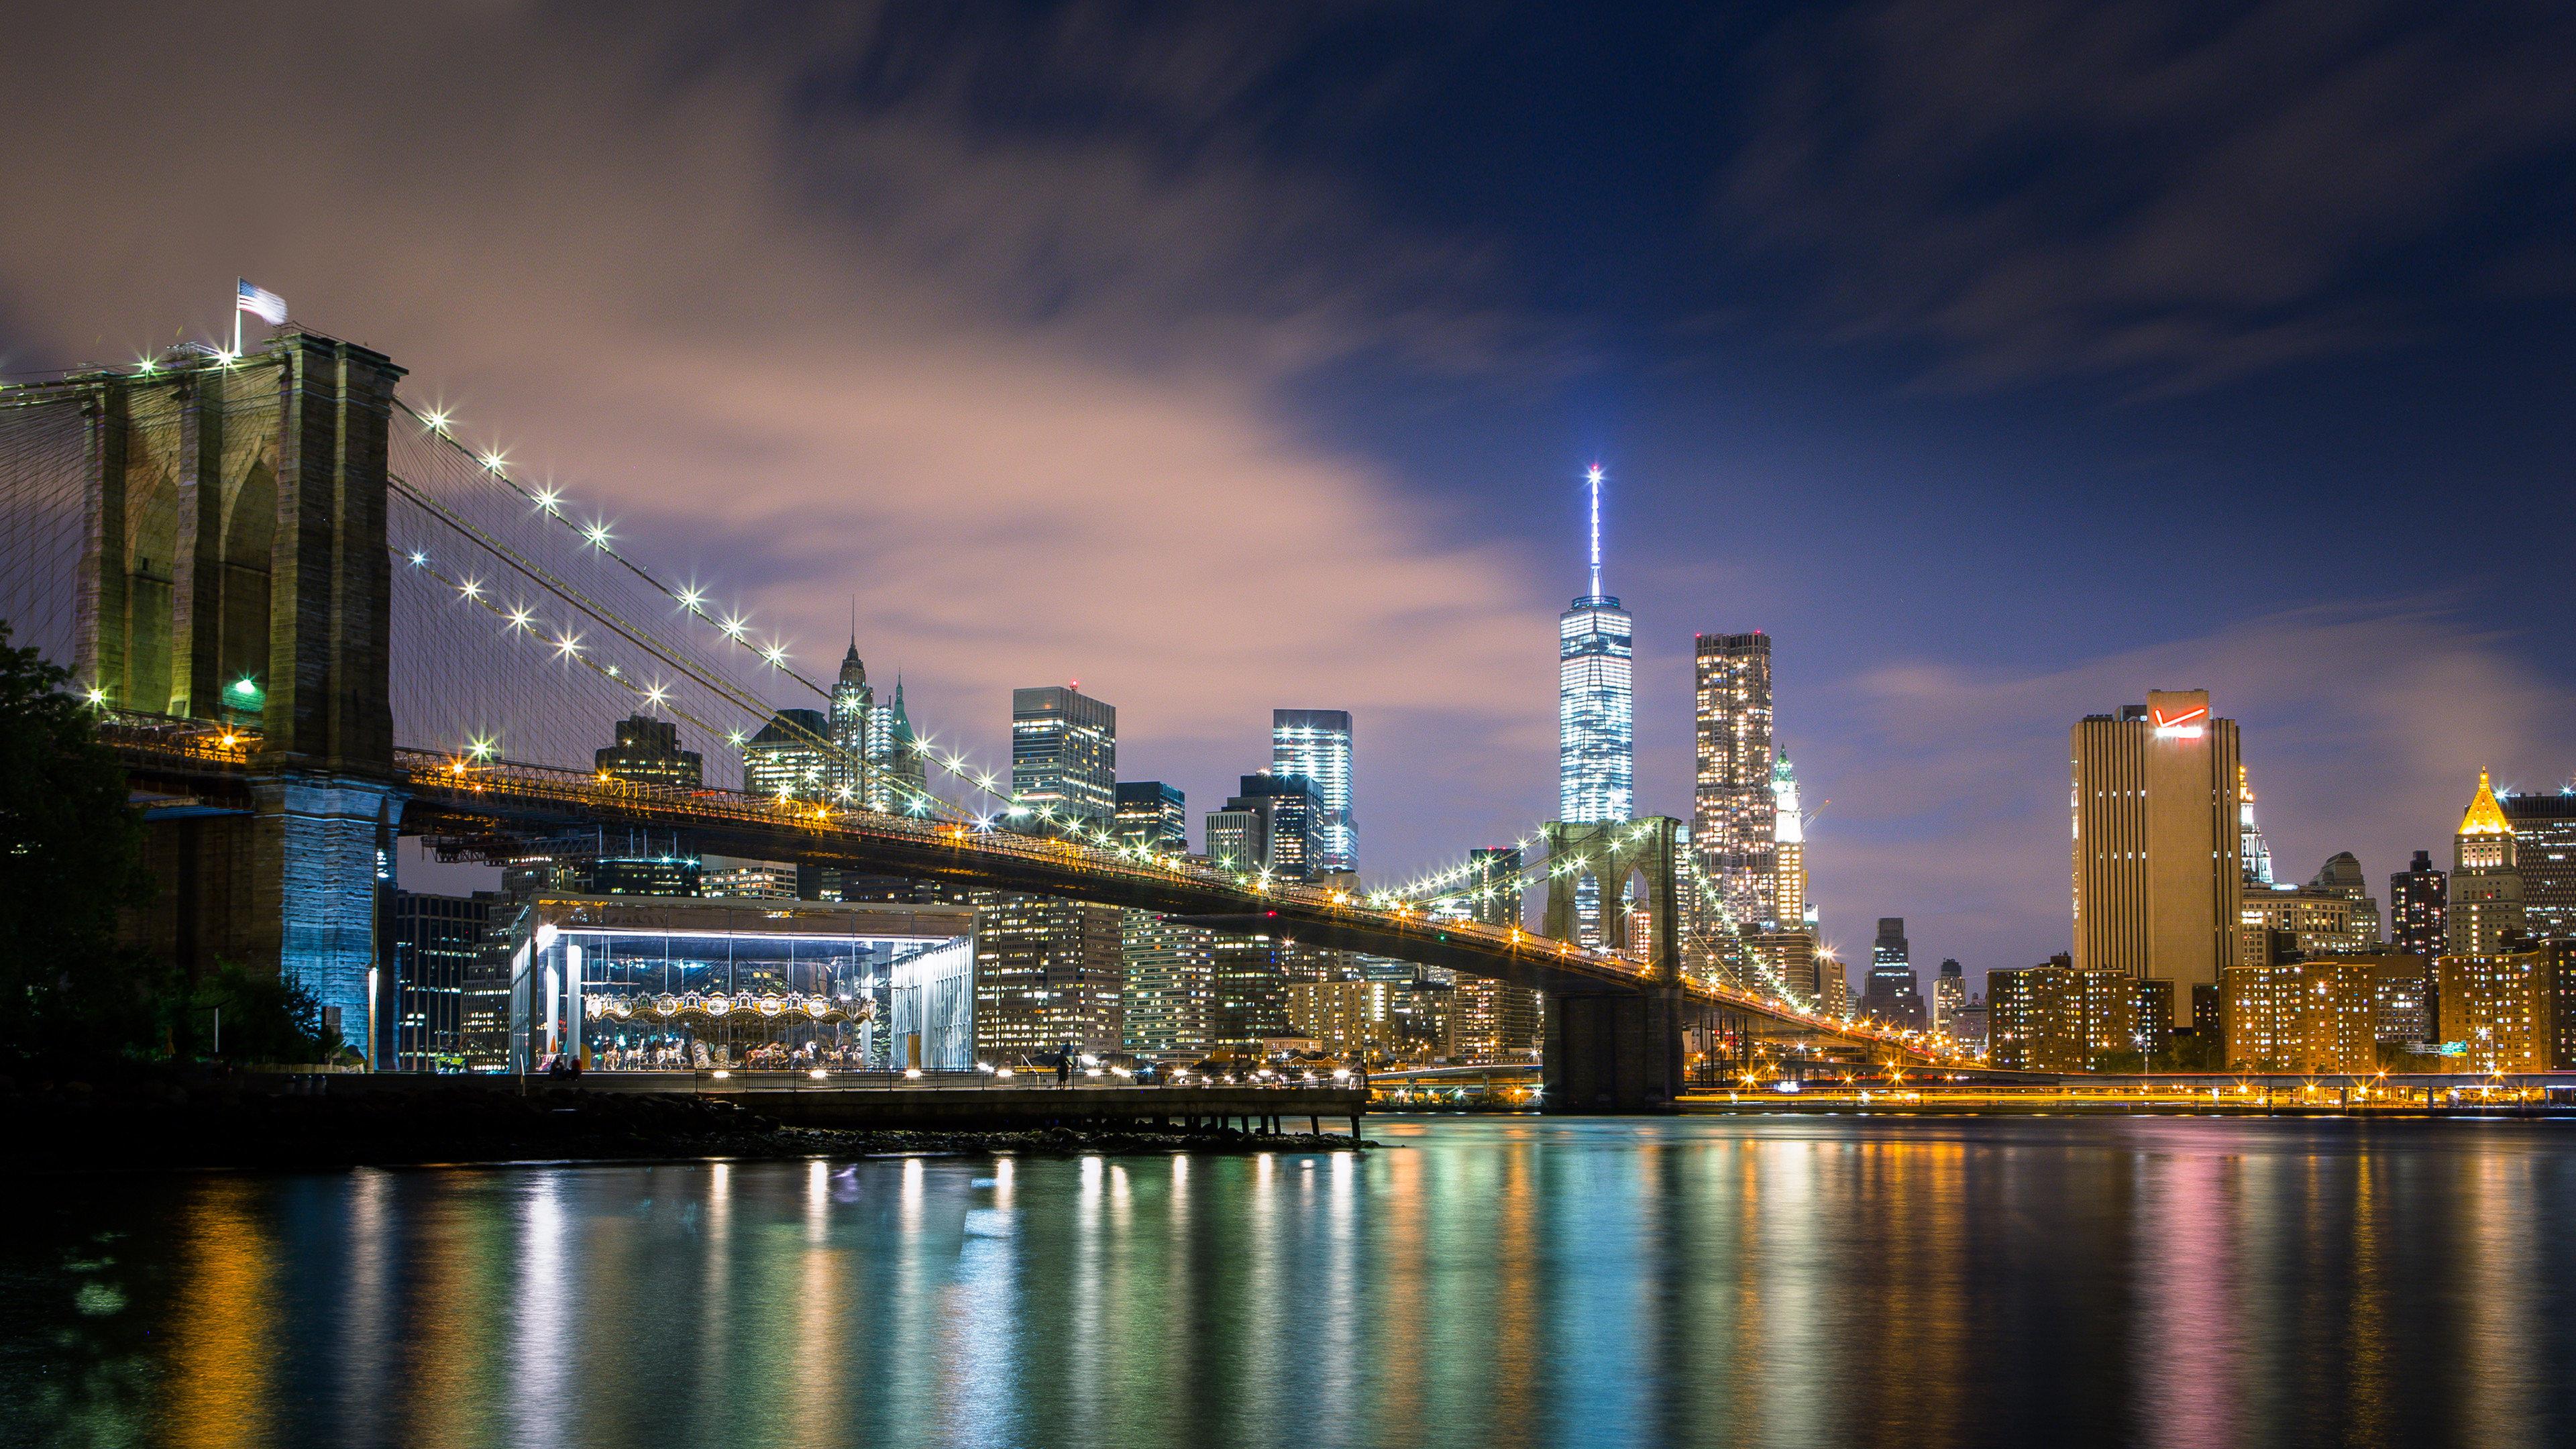 New York 4k Ultra Hd 3840x2160 Wallpaper Teahub Io